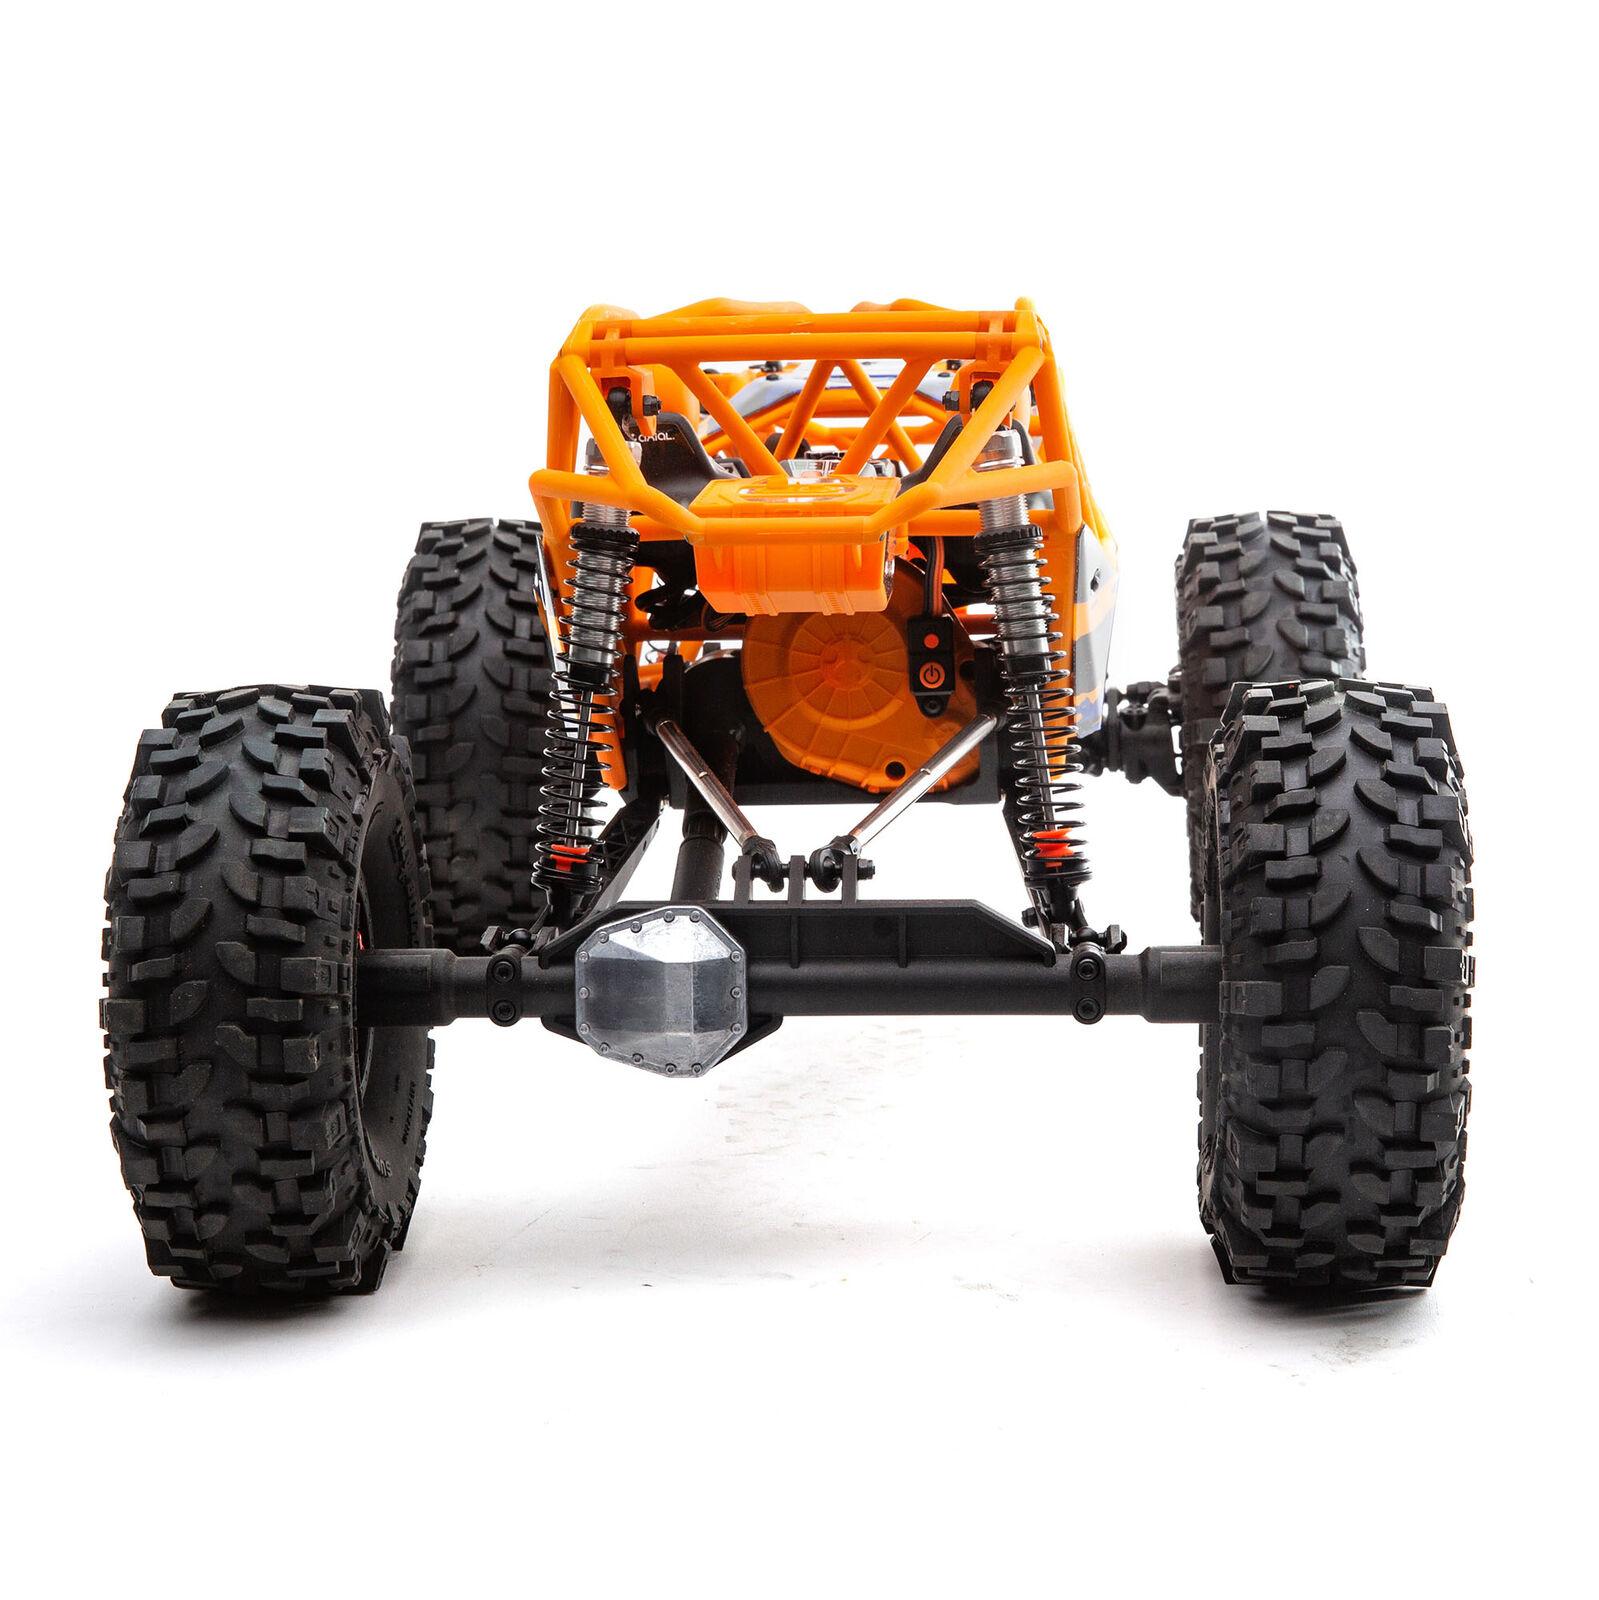 1/10 RBX10 Ryft 4WD Brushless Rock Bouncer RTR, Orange